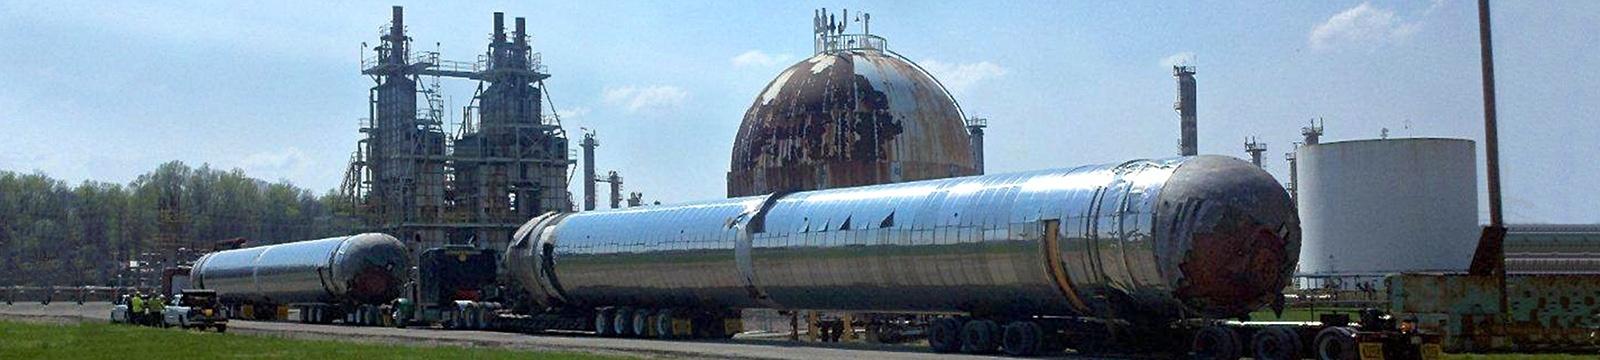 NGL LPG Propane Butane Storage Plants & Terminals - Dismantling Demolition Removal Services_.jpg